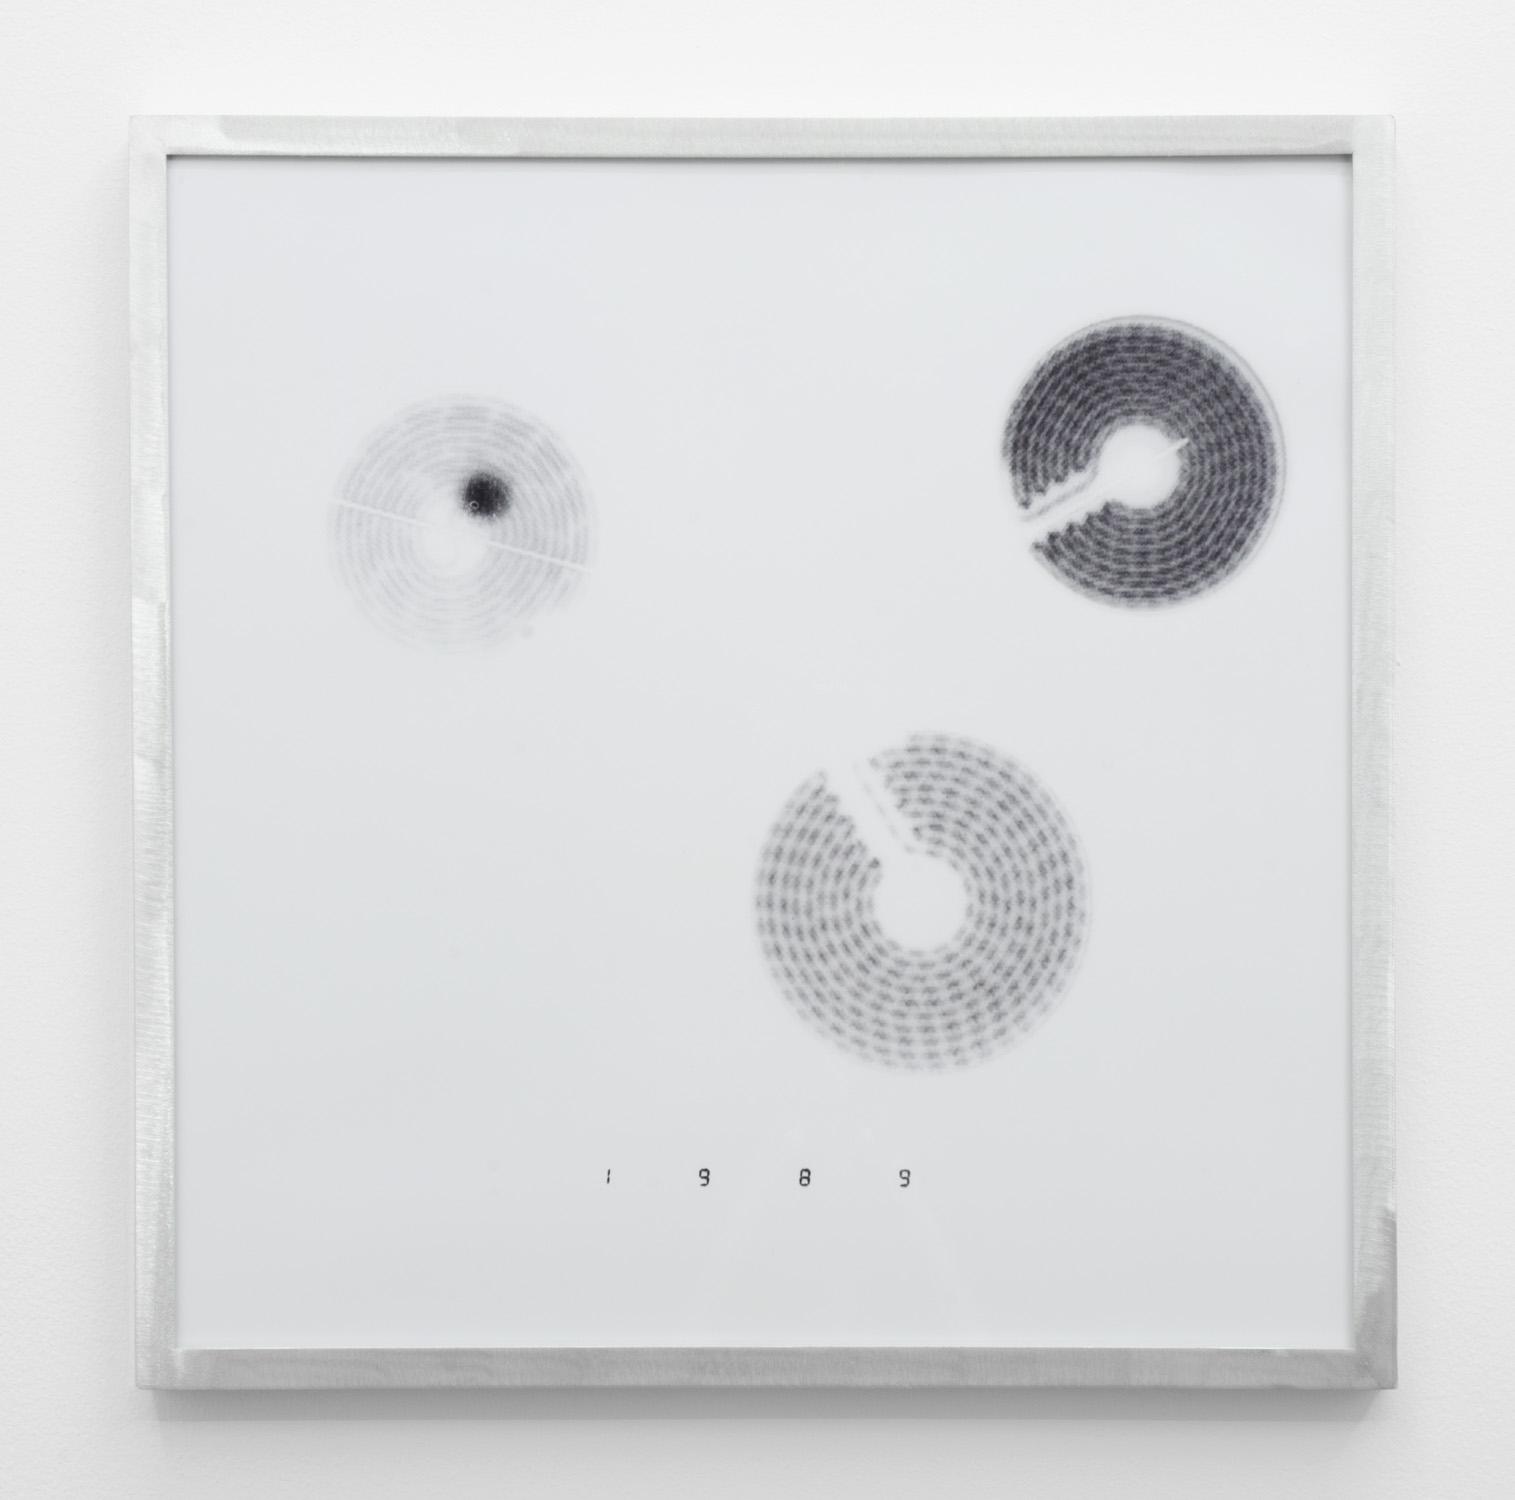 IR-4 , 2014, giclee print on hahnemuhle photorag, custom aluminium frame 40 x 40 cm.